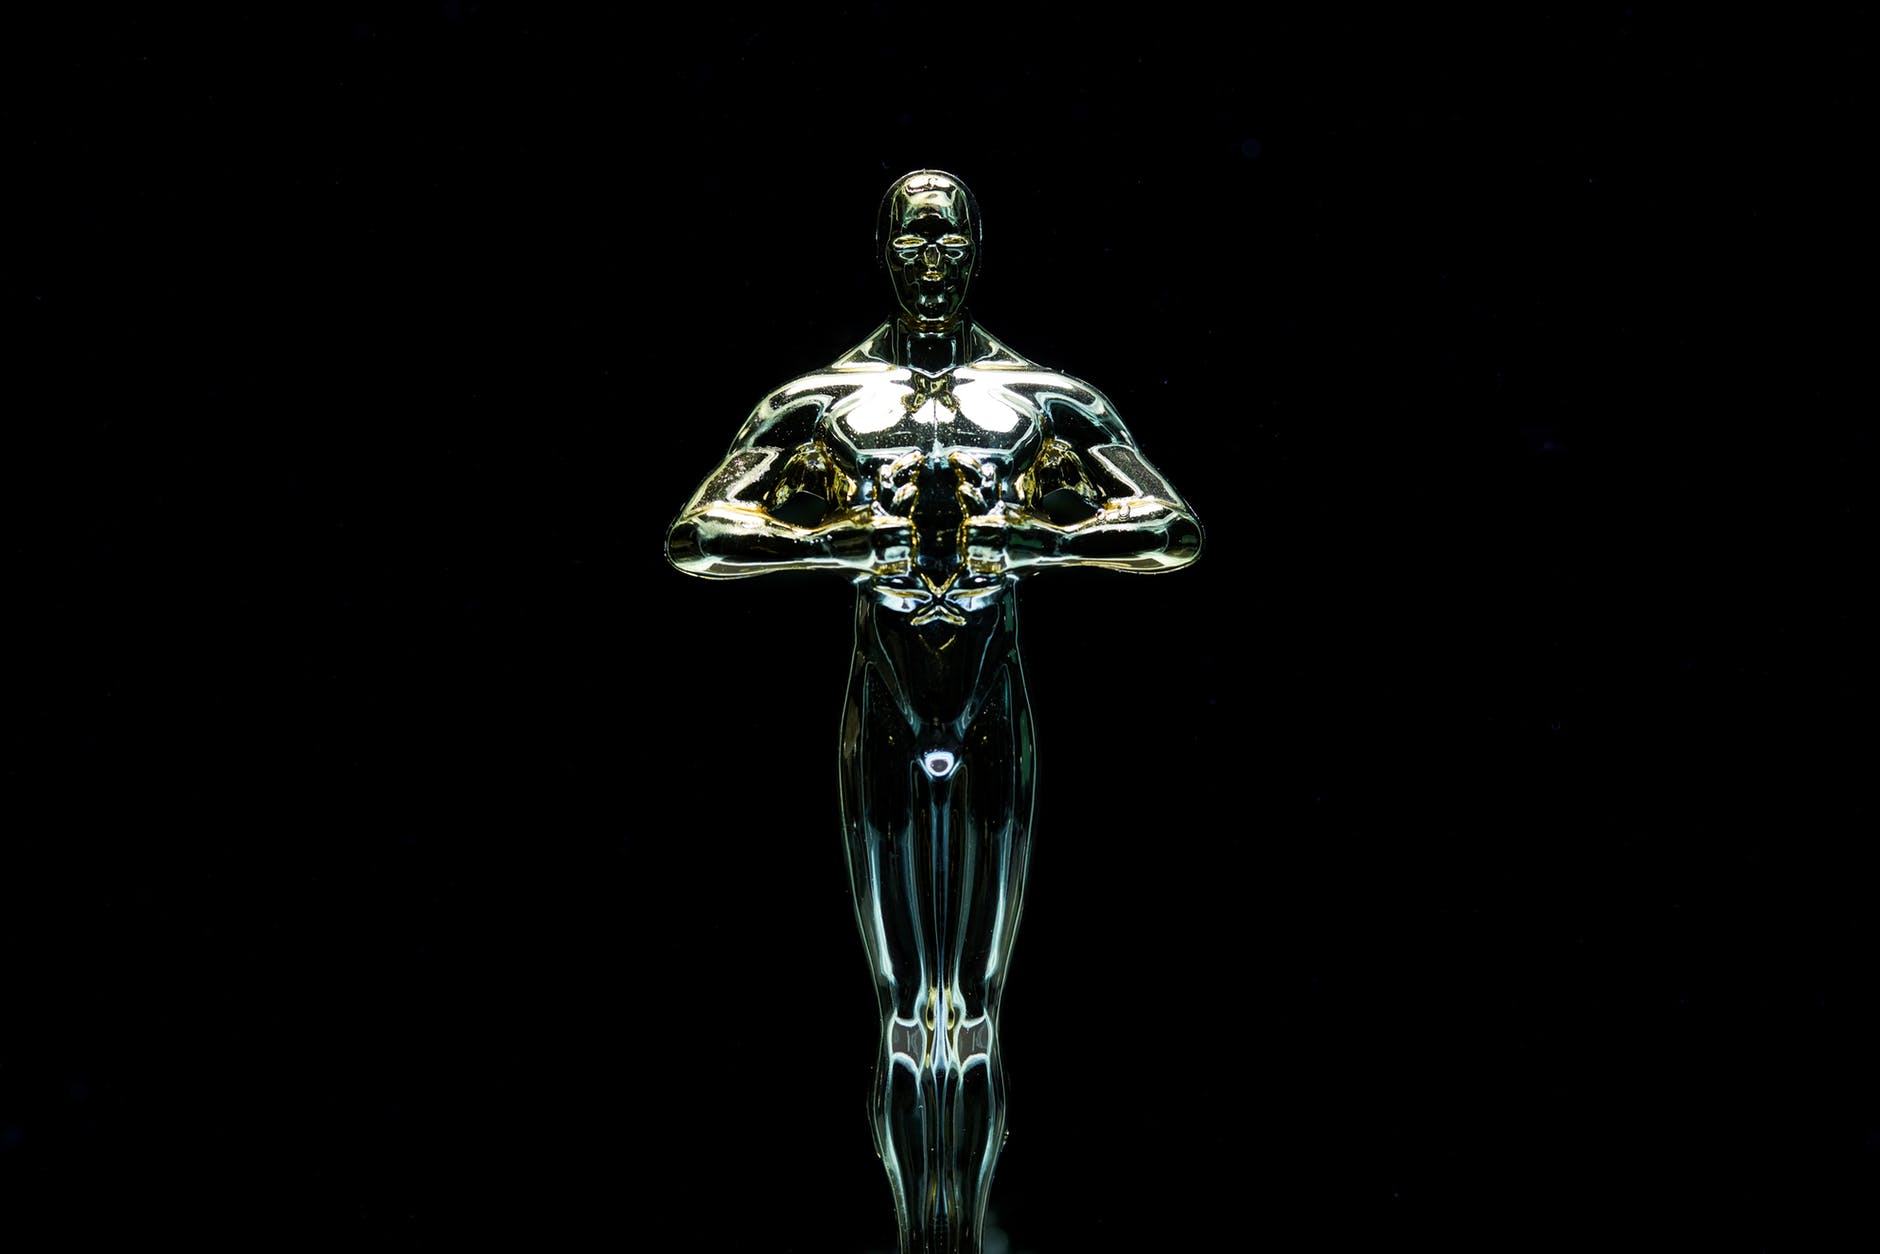 standing man figurine